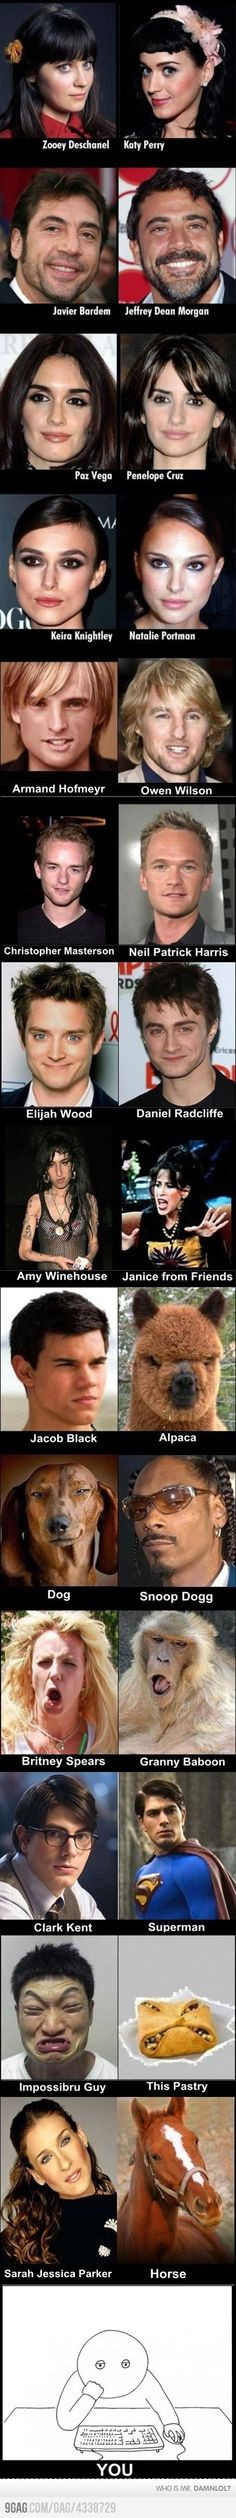 Celebrity Lookalikes